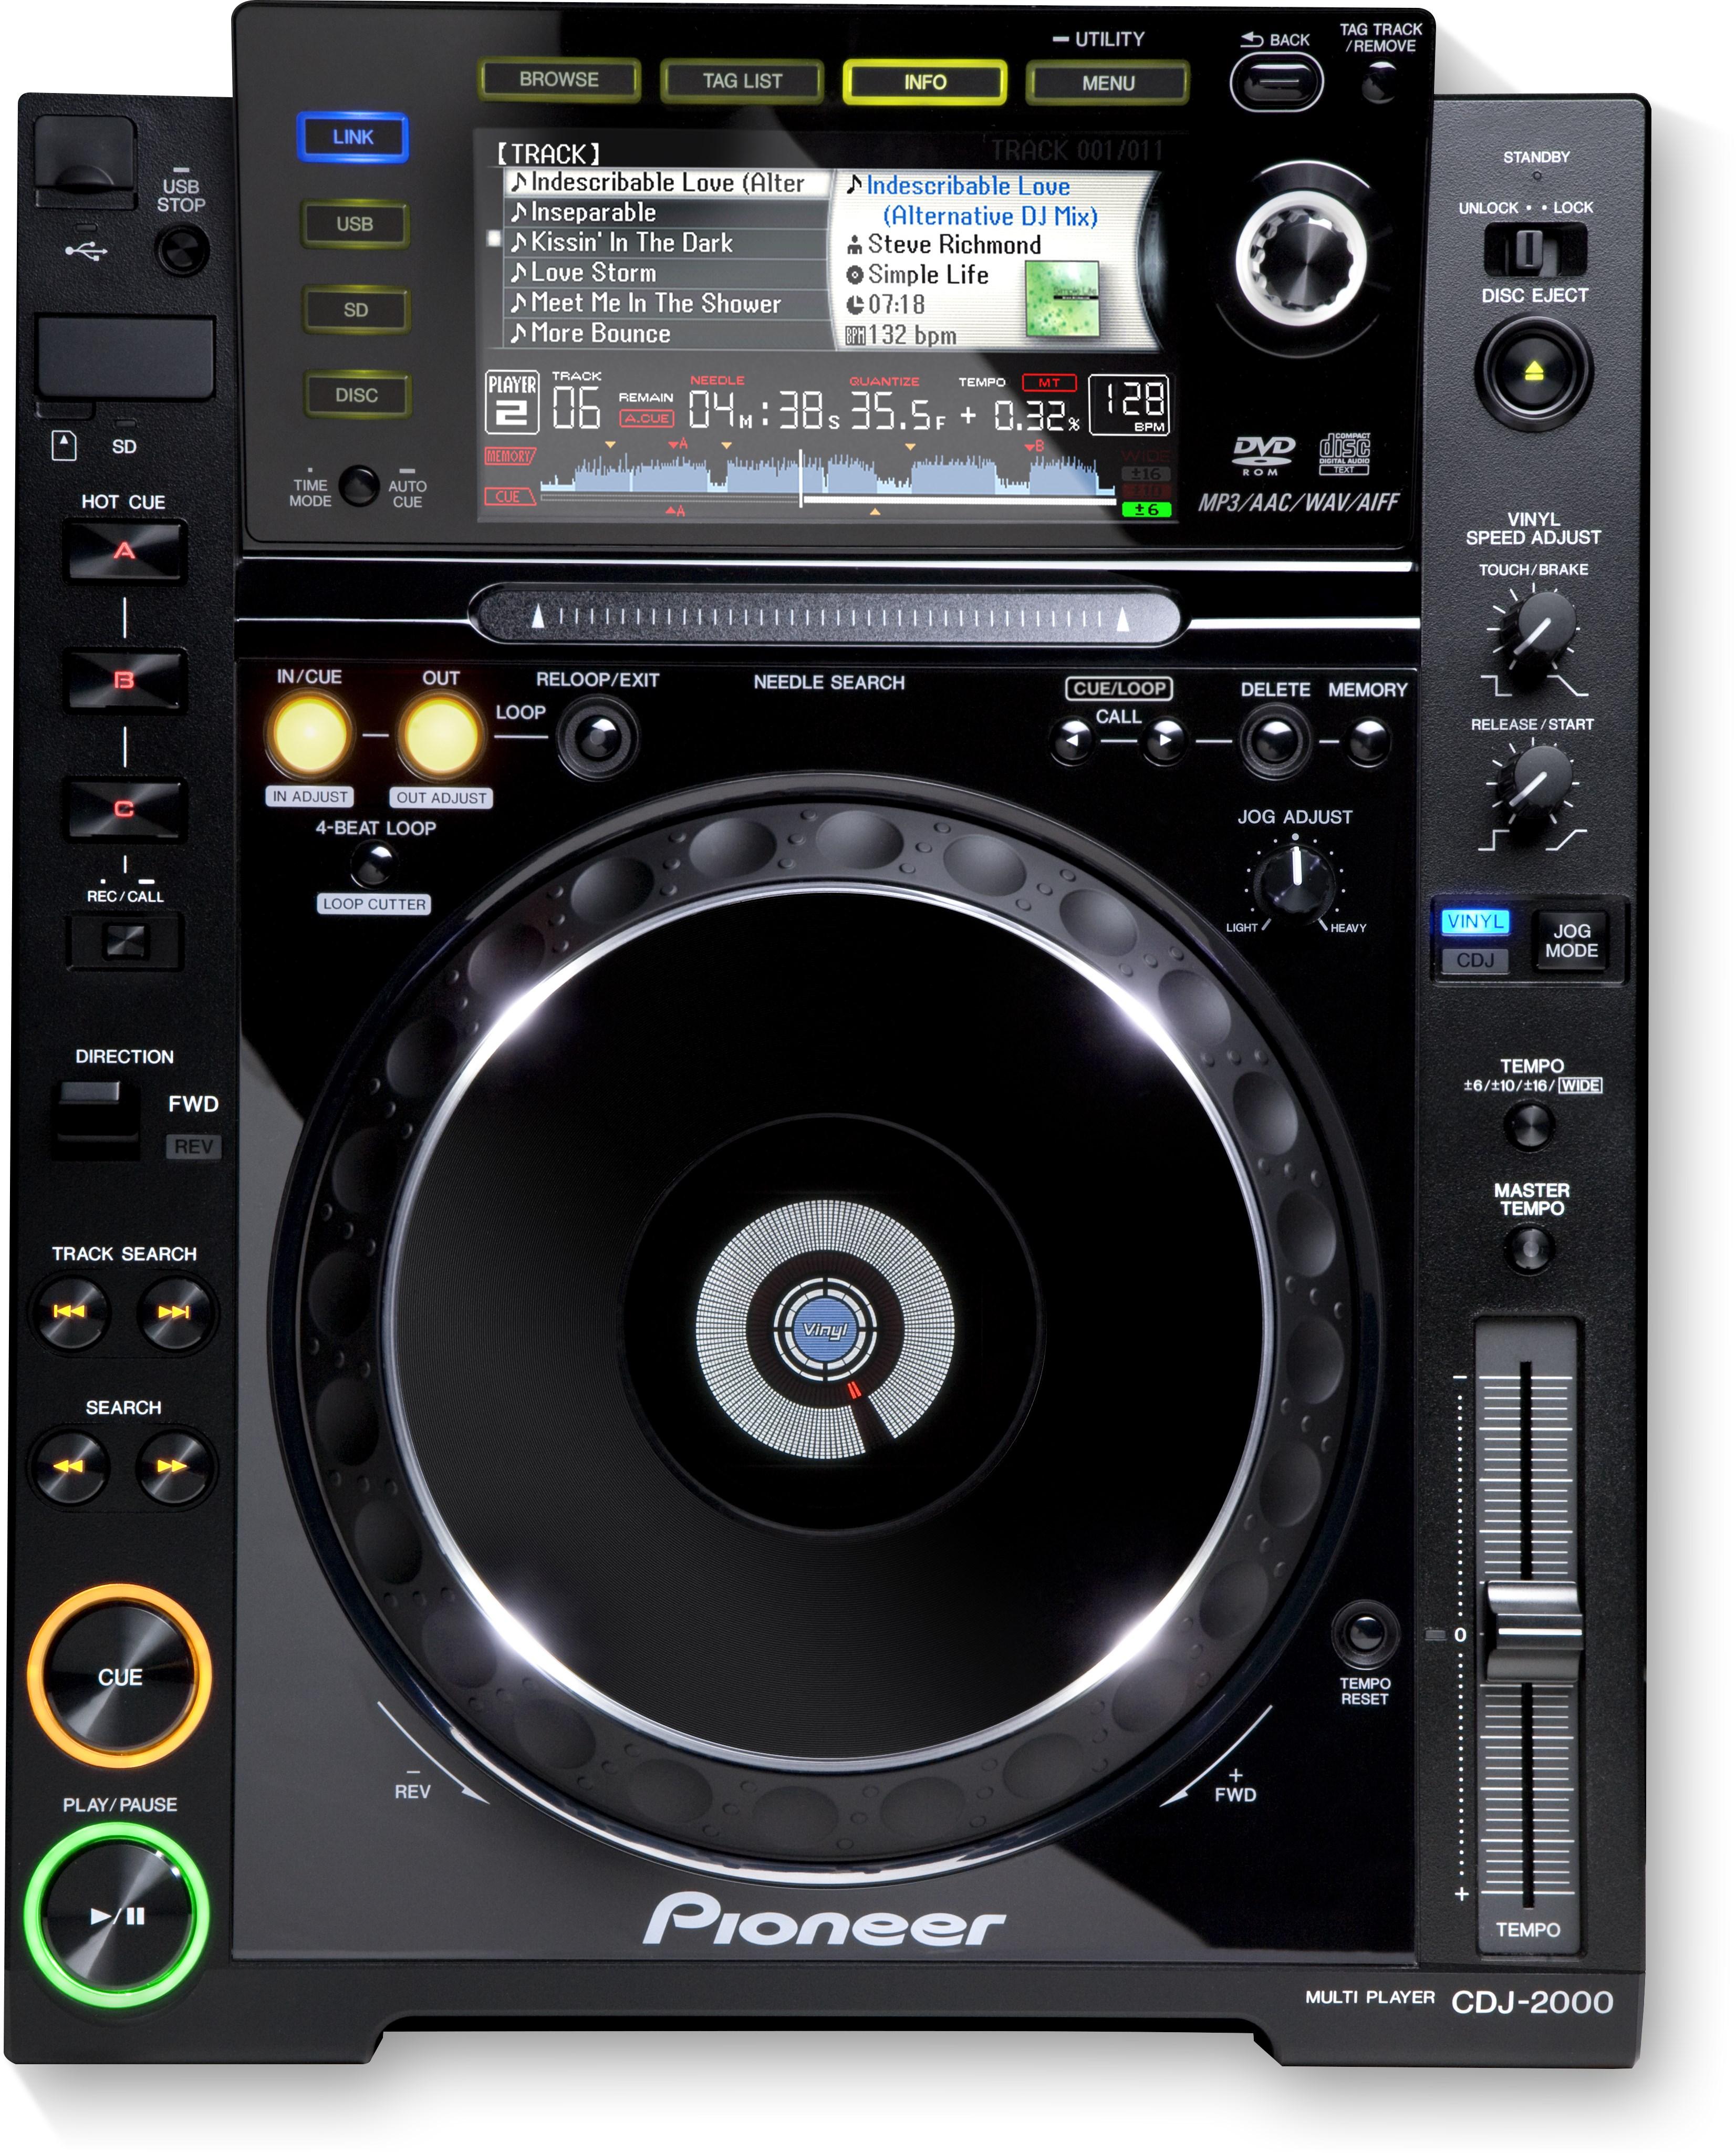 CDJ-2000